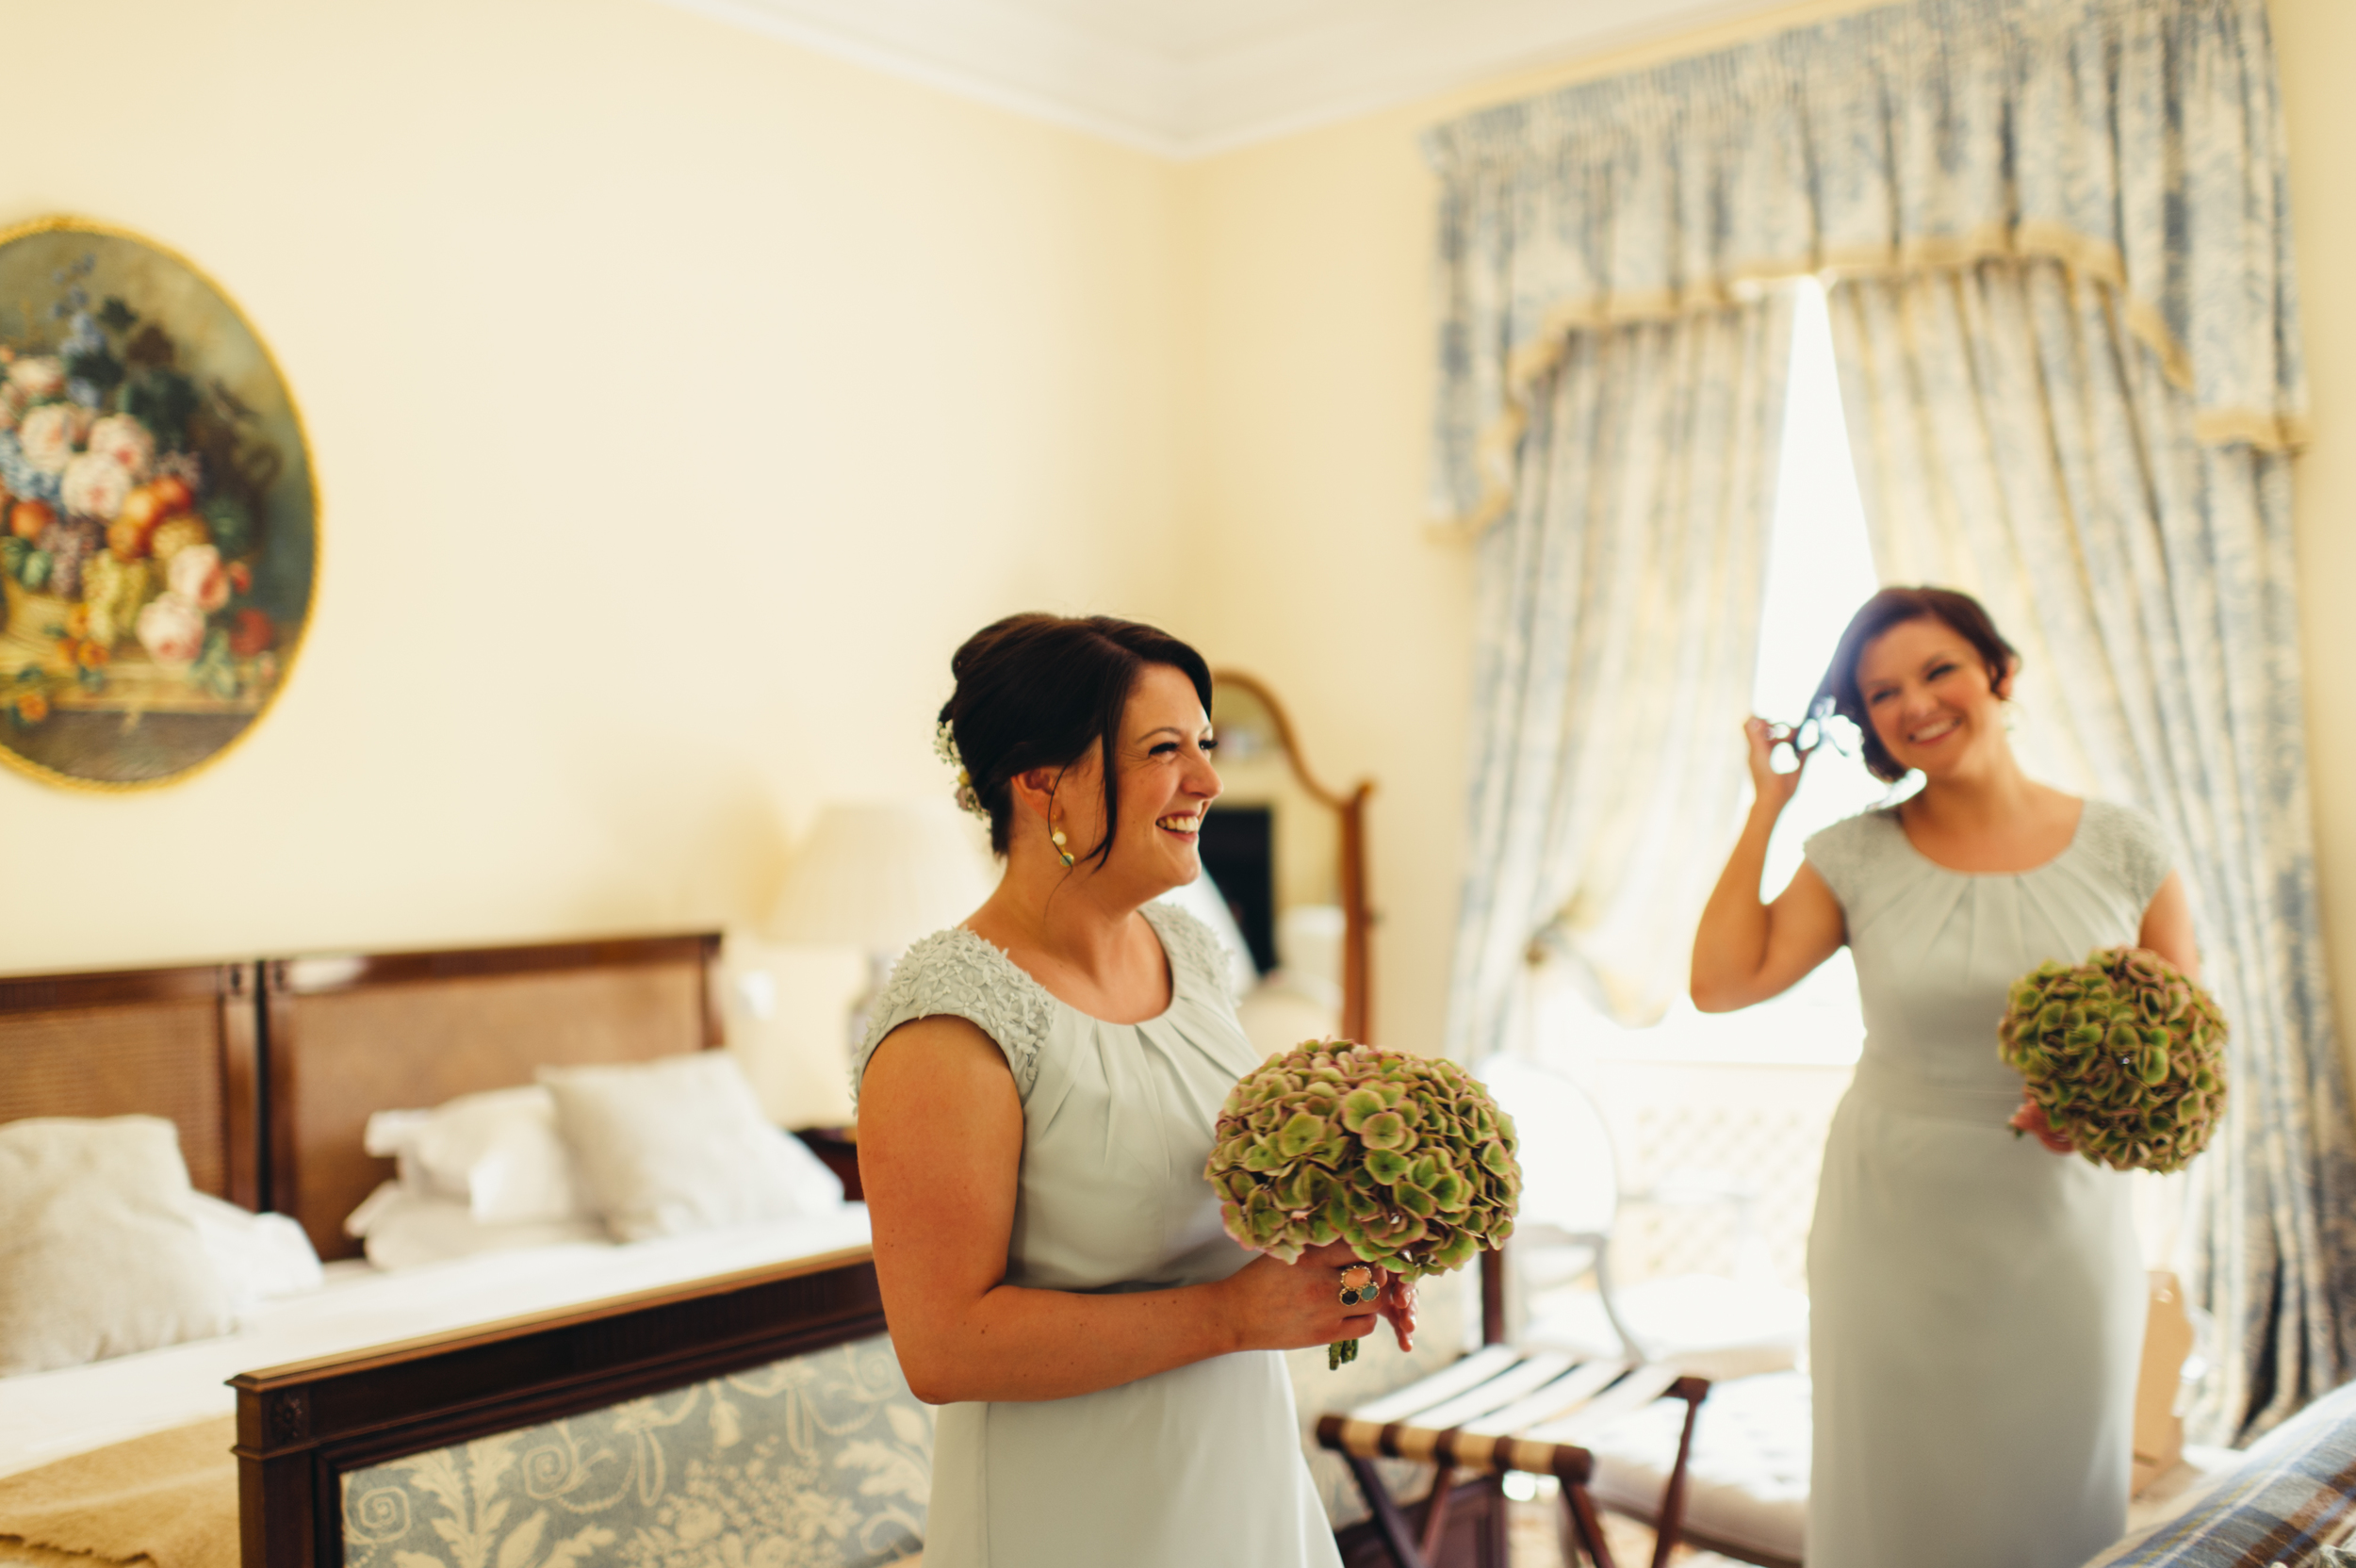 0085-lisa-devine-alternative-creative-wedding-photography-glasgow-edinburgh.JPG